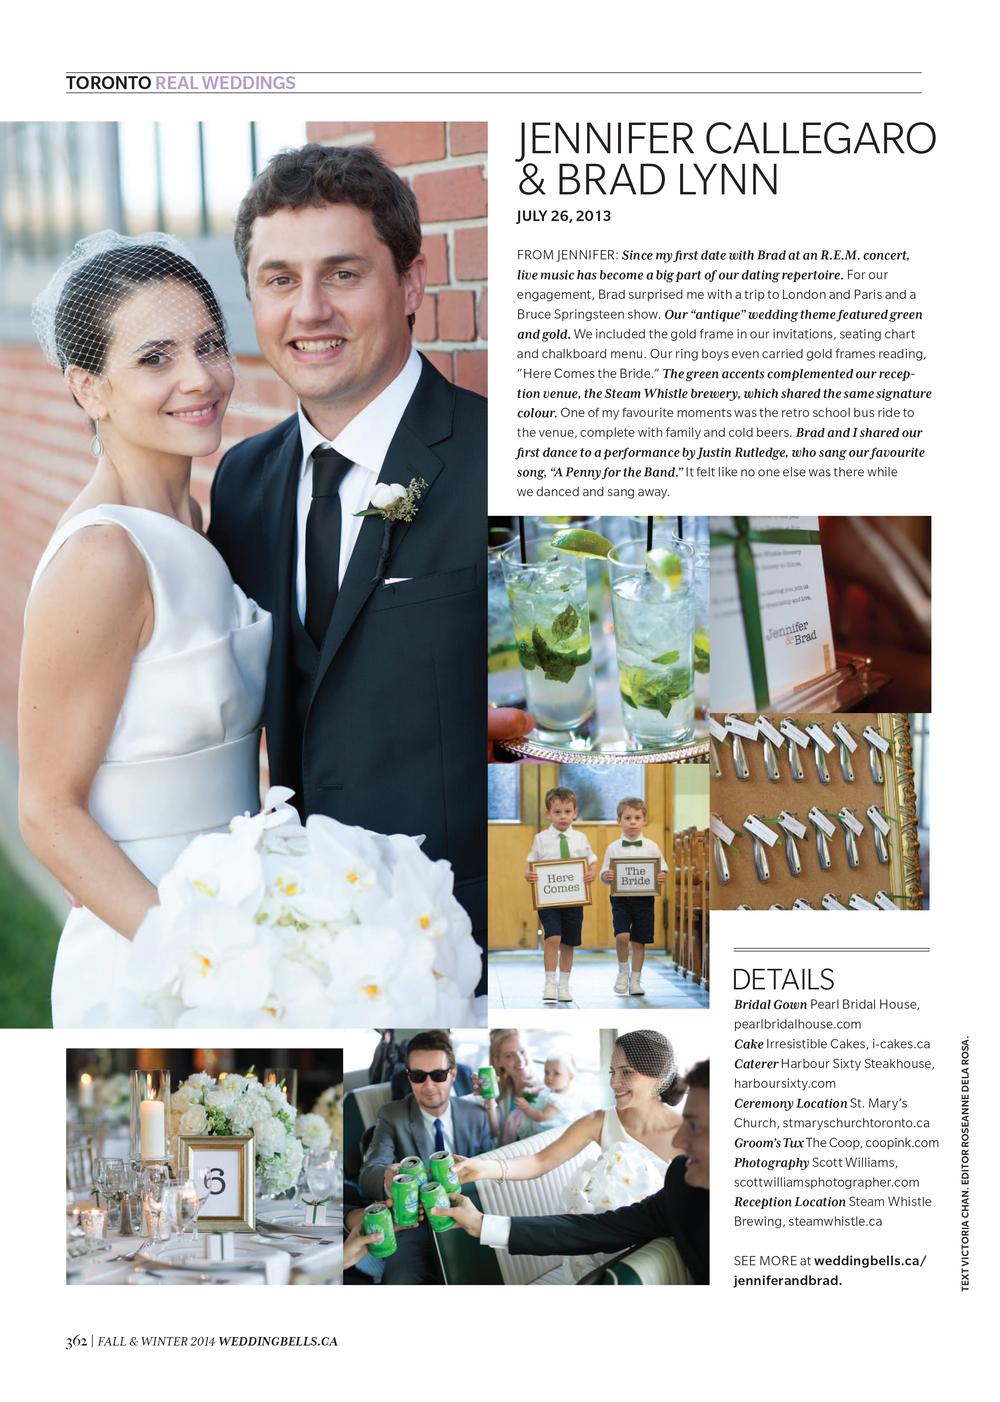 Pearl Bridal House in Weddingbells Fall Winter 2014 Editorial.jpg